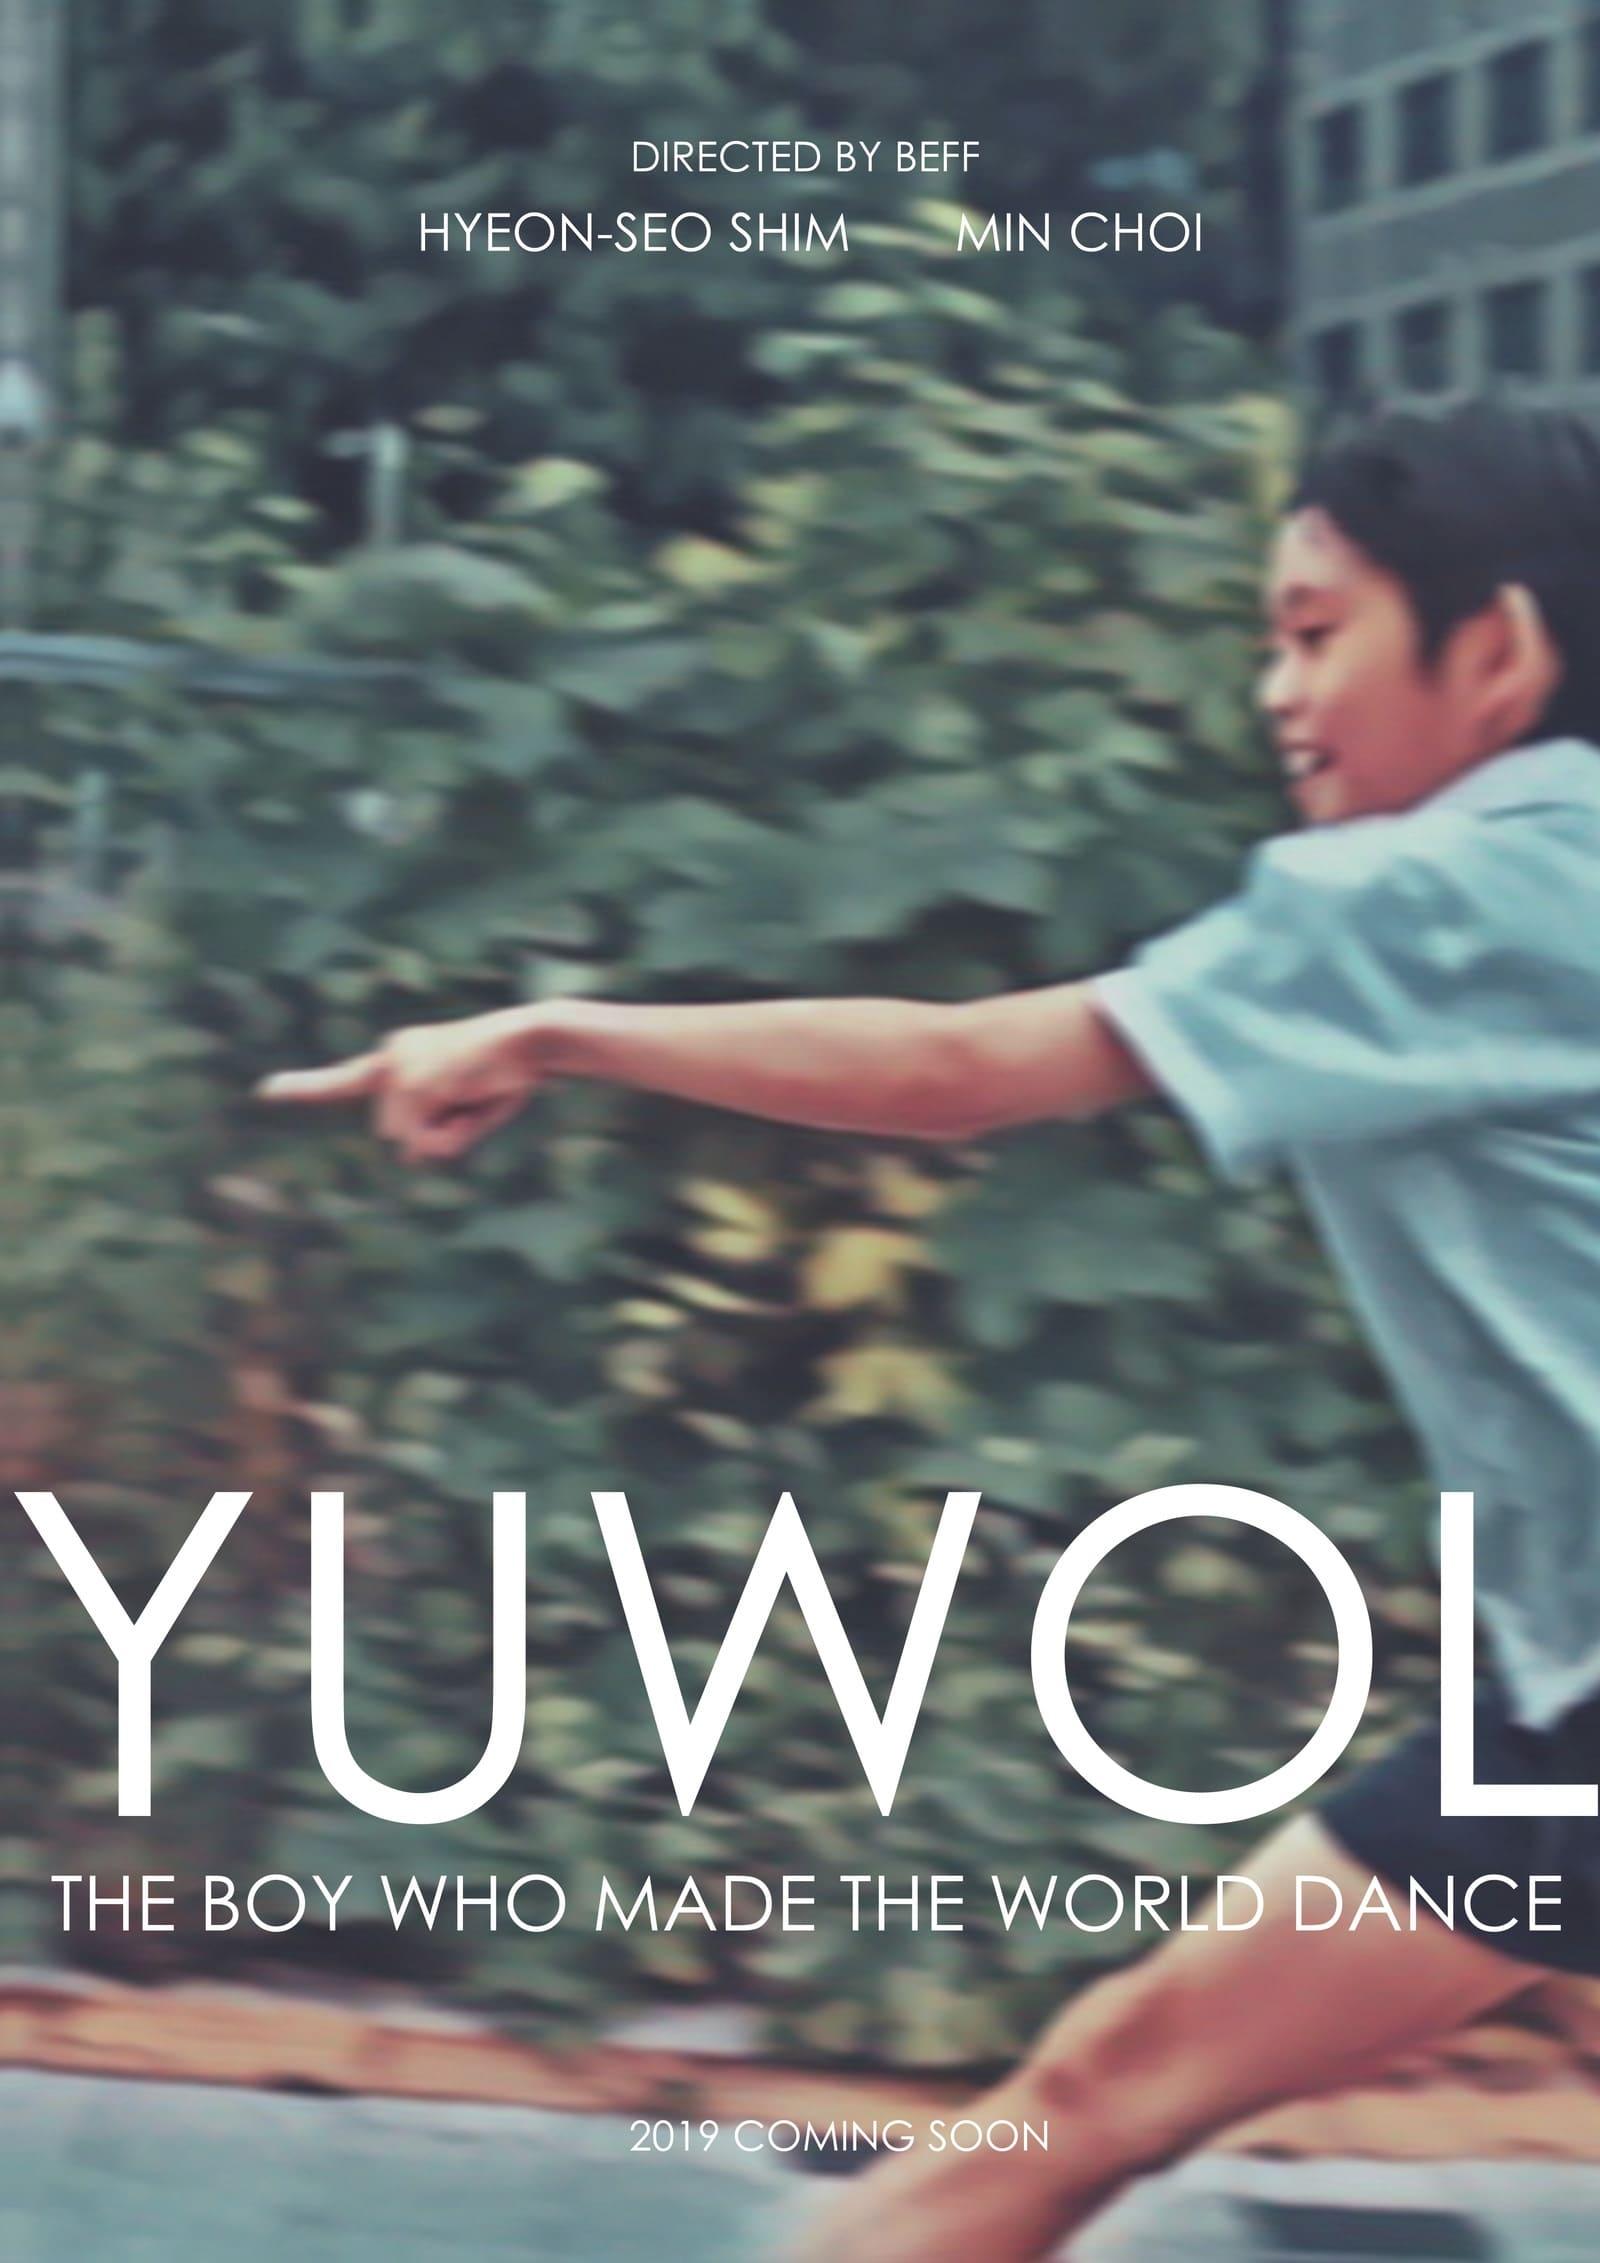 Yuwol: The Boy Who Made The World Dance